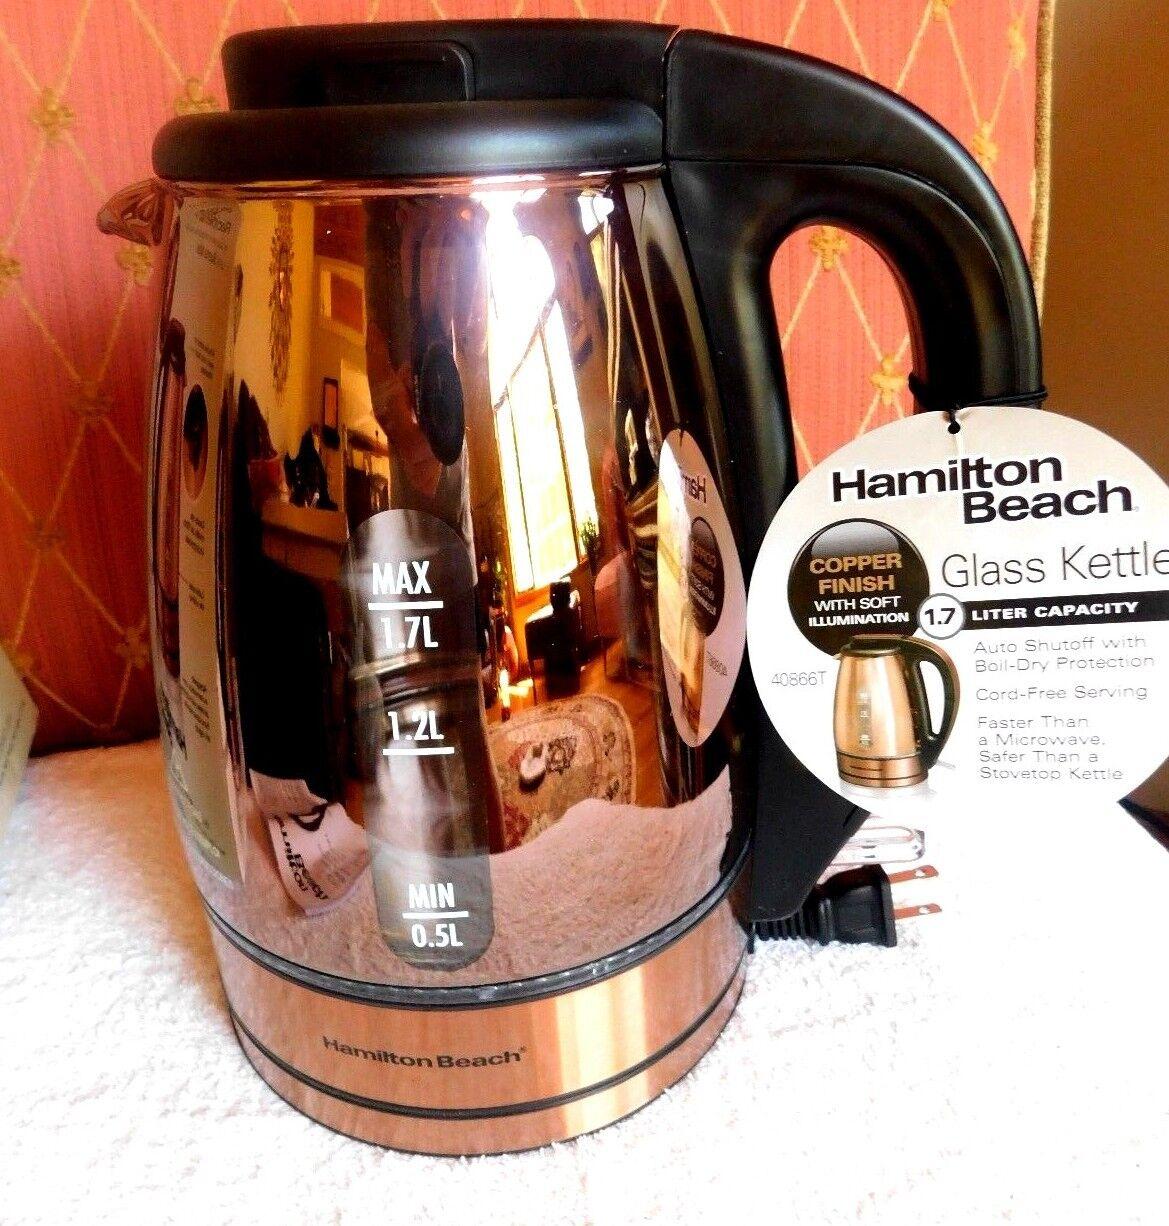 Hamilton Beach Glass Kettle Copper Hot Coffee Water Kitchen Boiler Pot Cordless